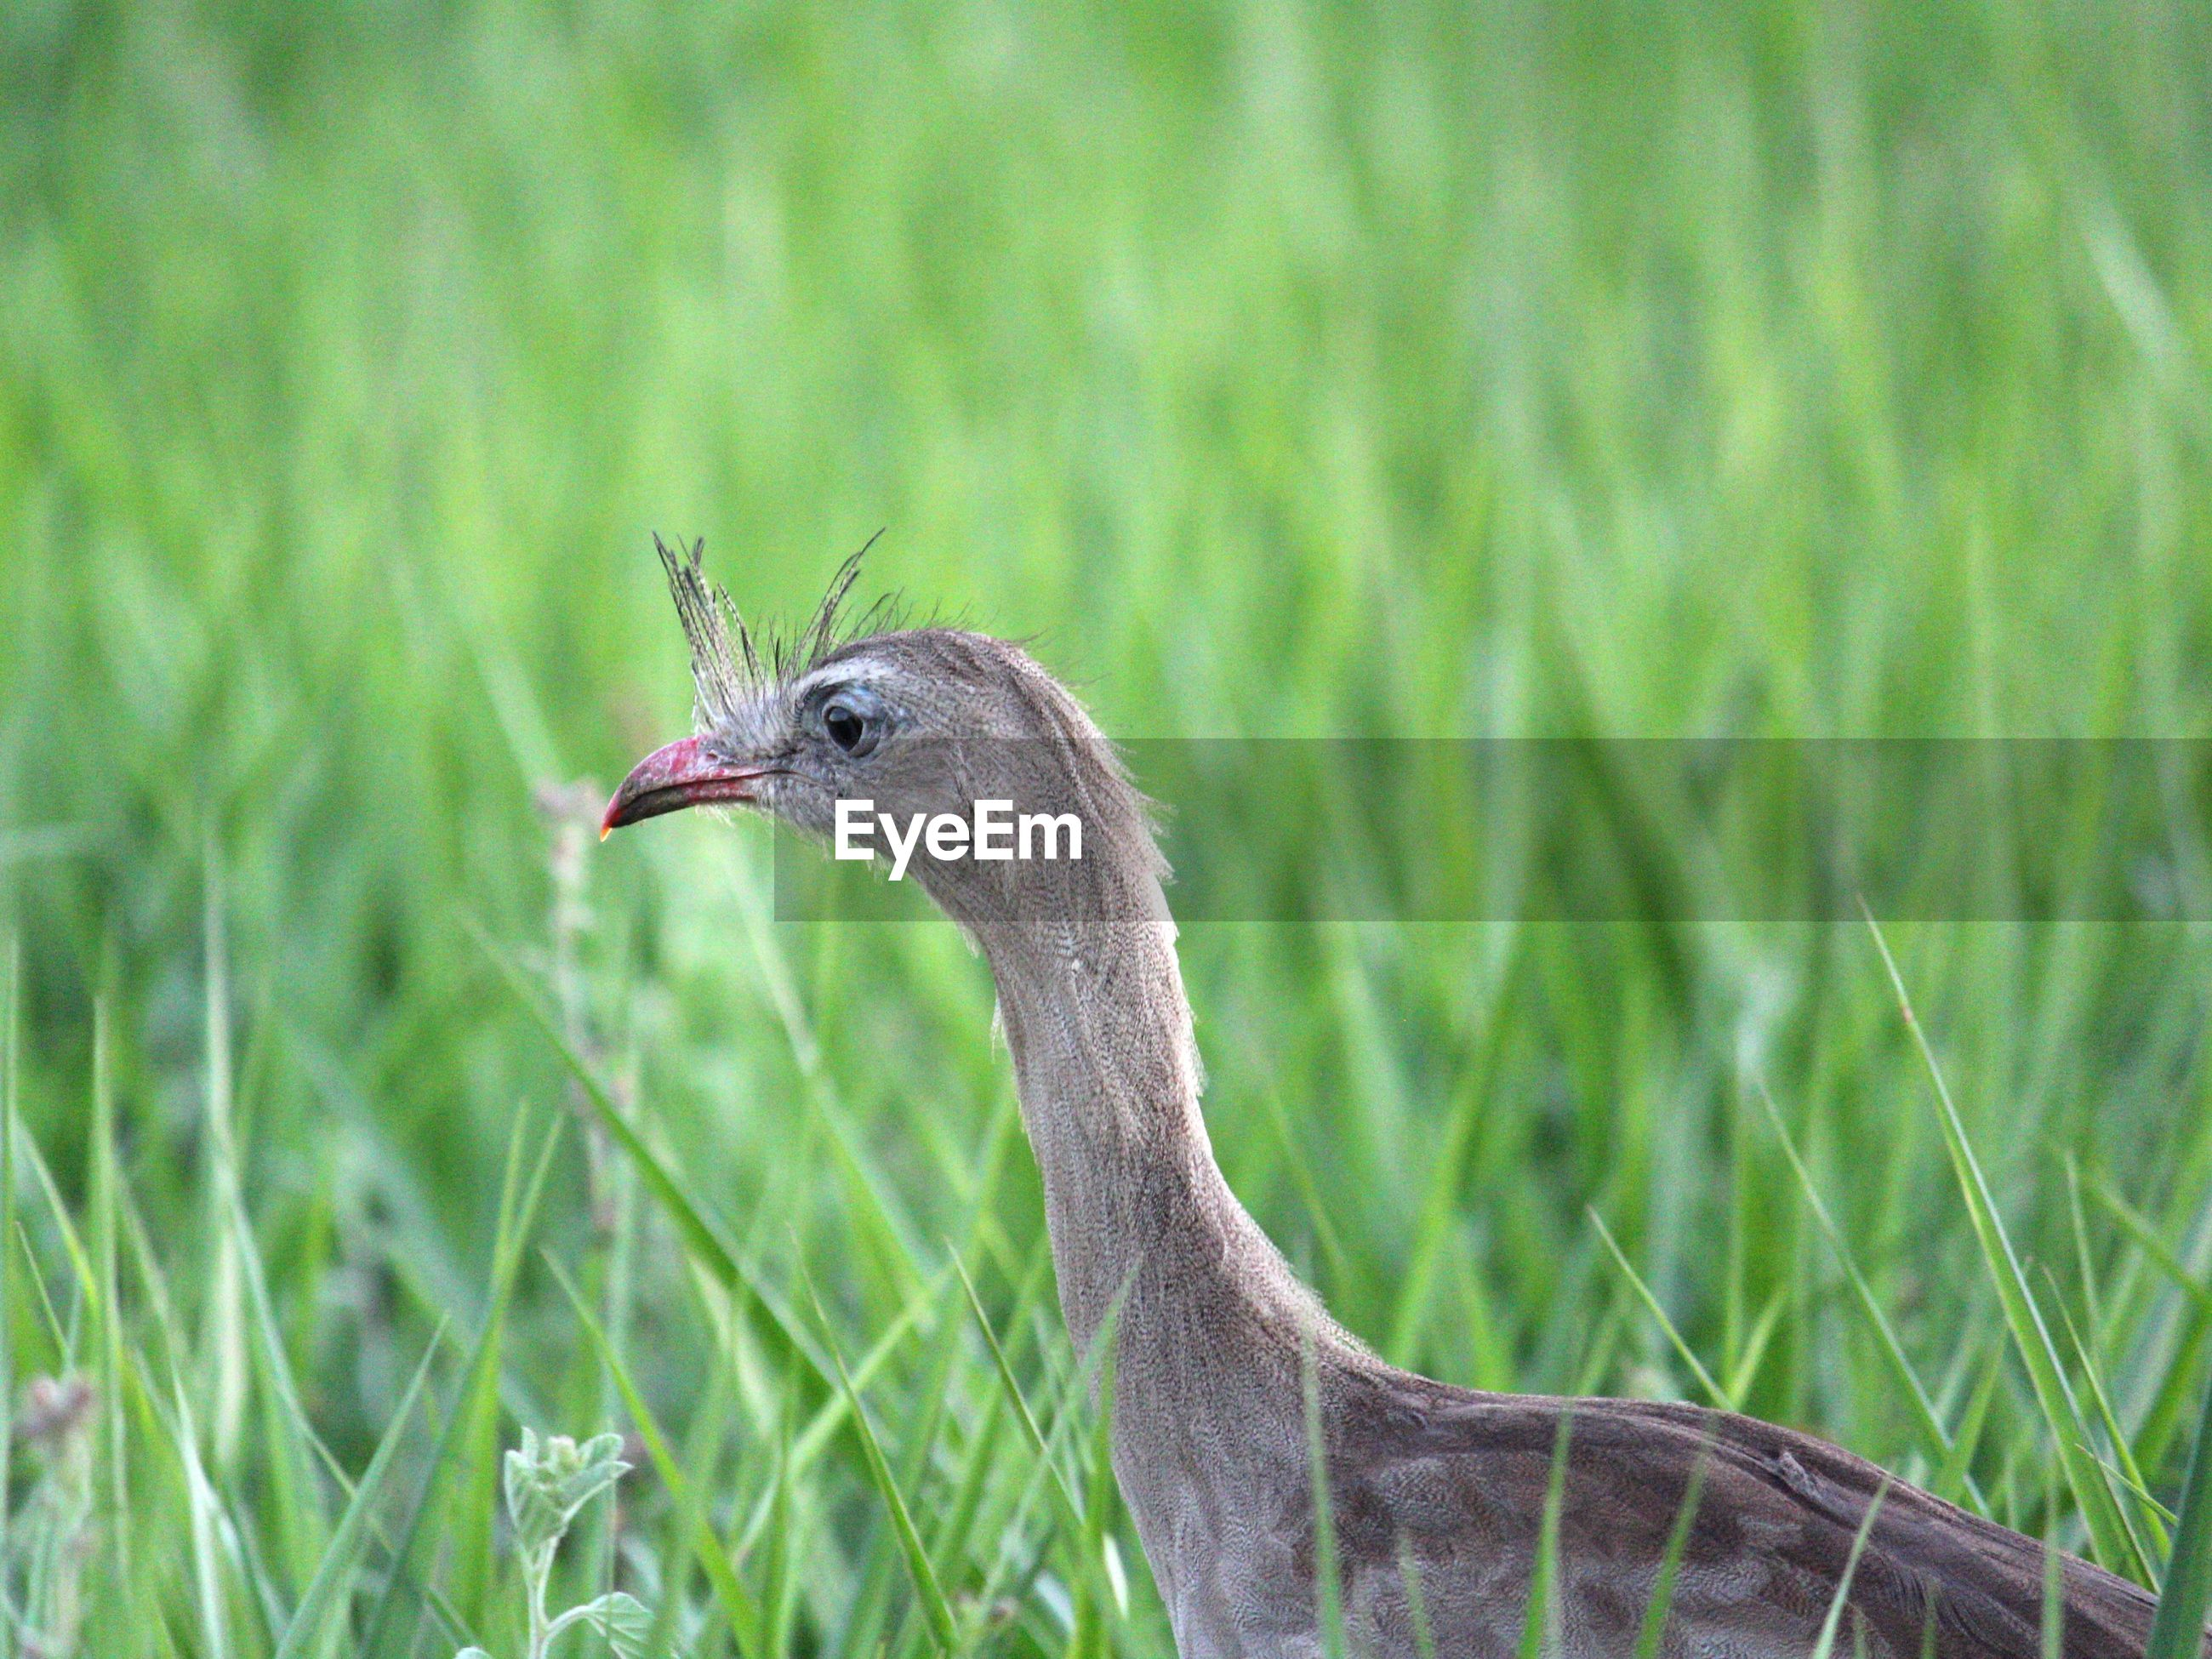 CLOSE-UP OF A BIRD ON A LAND